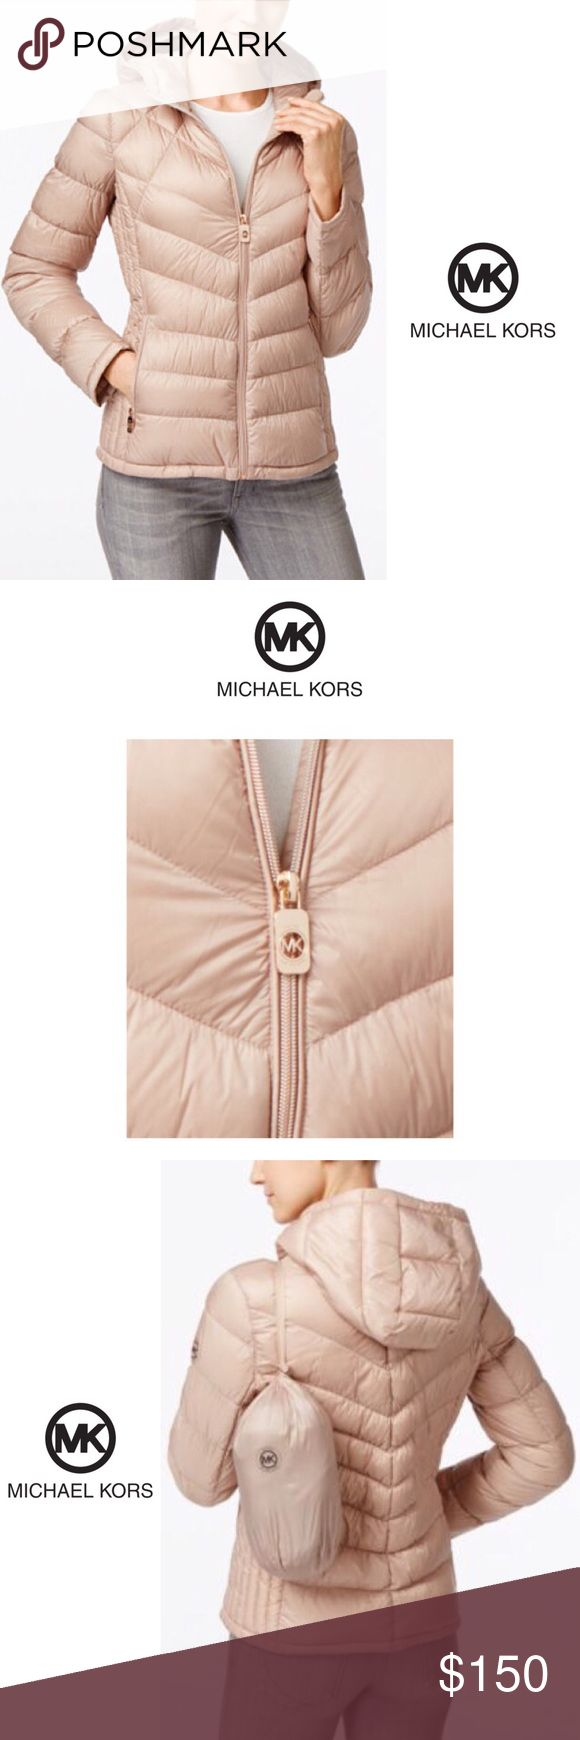 ❤️NEW➰HP➰Michael Kors➰Packable Coat➰CHAMPAGNE[L]• BOUTIQUE • \\Michael Kors// NWT ::: MICHAEL Michael Kors Chevron Hooded Packable Down Puffer Coat ::: Size (L) Color[Champagne] ::: Originally [$175]• Michael Kors Jackets & Coats Puffers